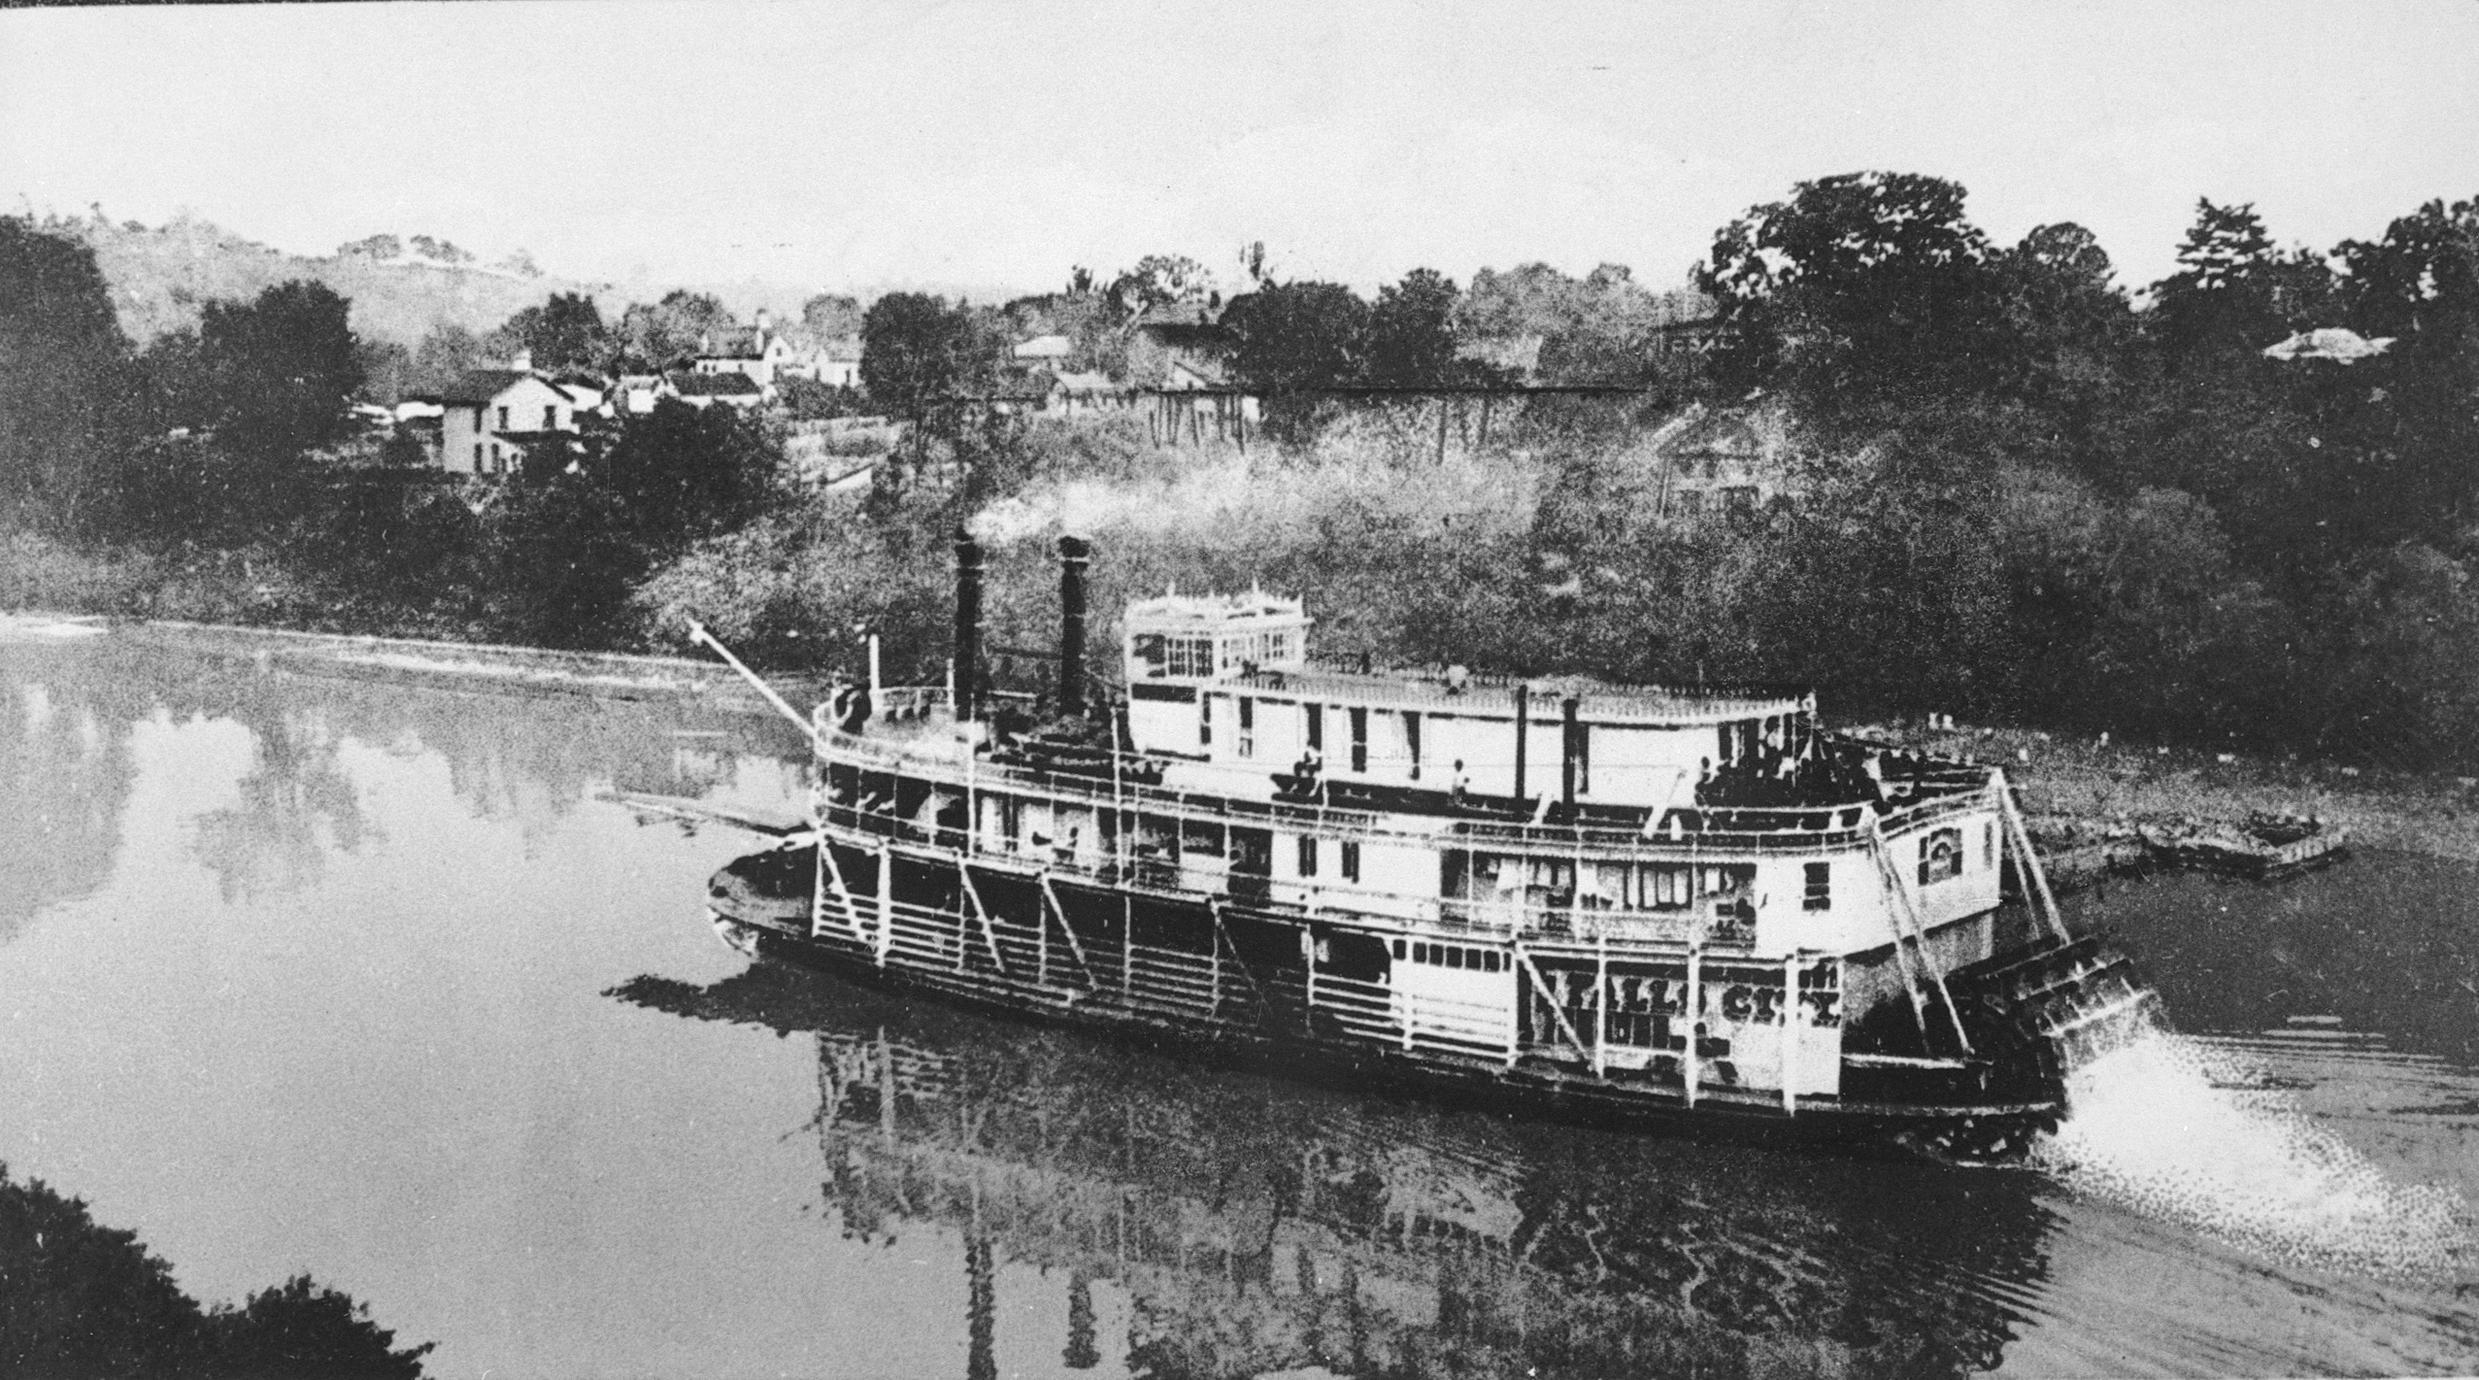 Falls City (Packet, 1890-1899)